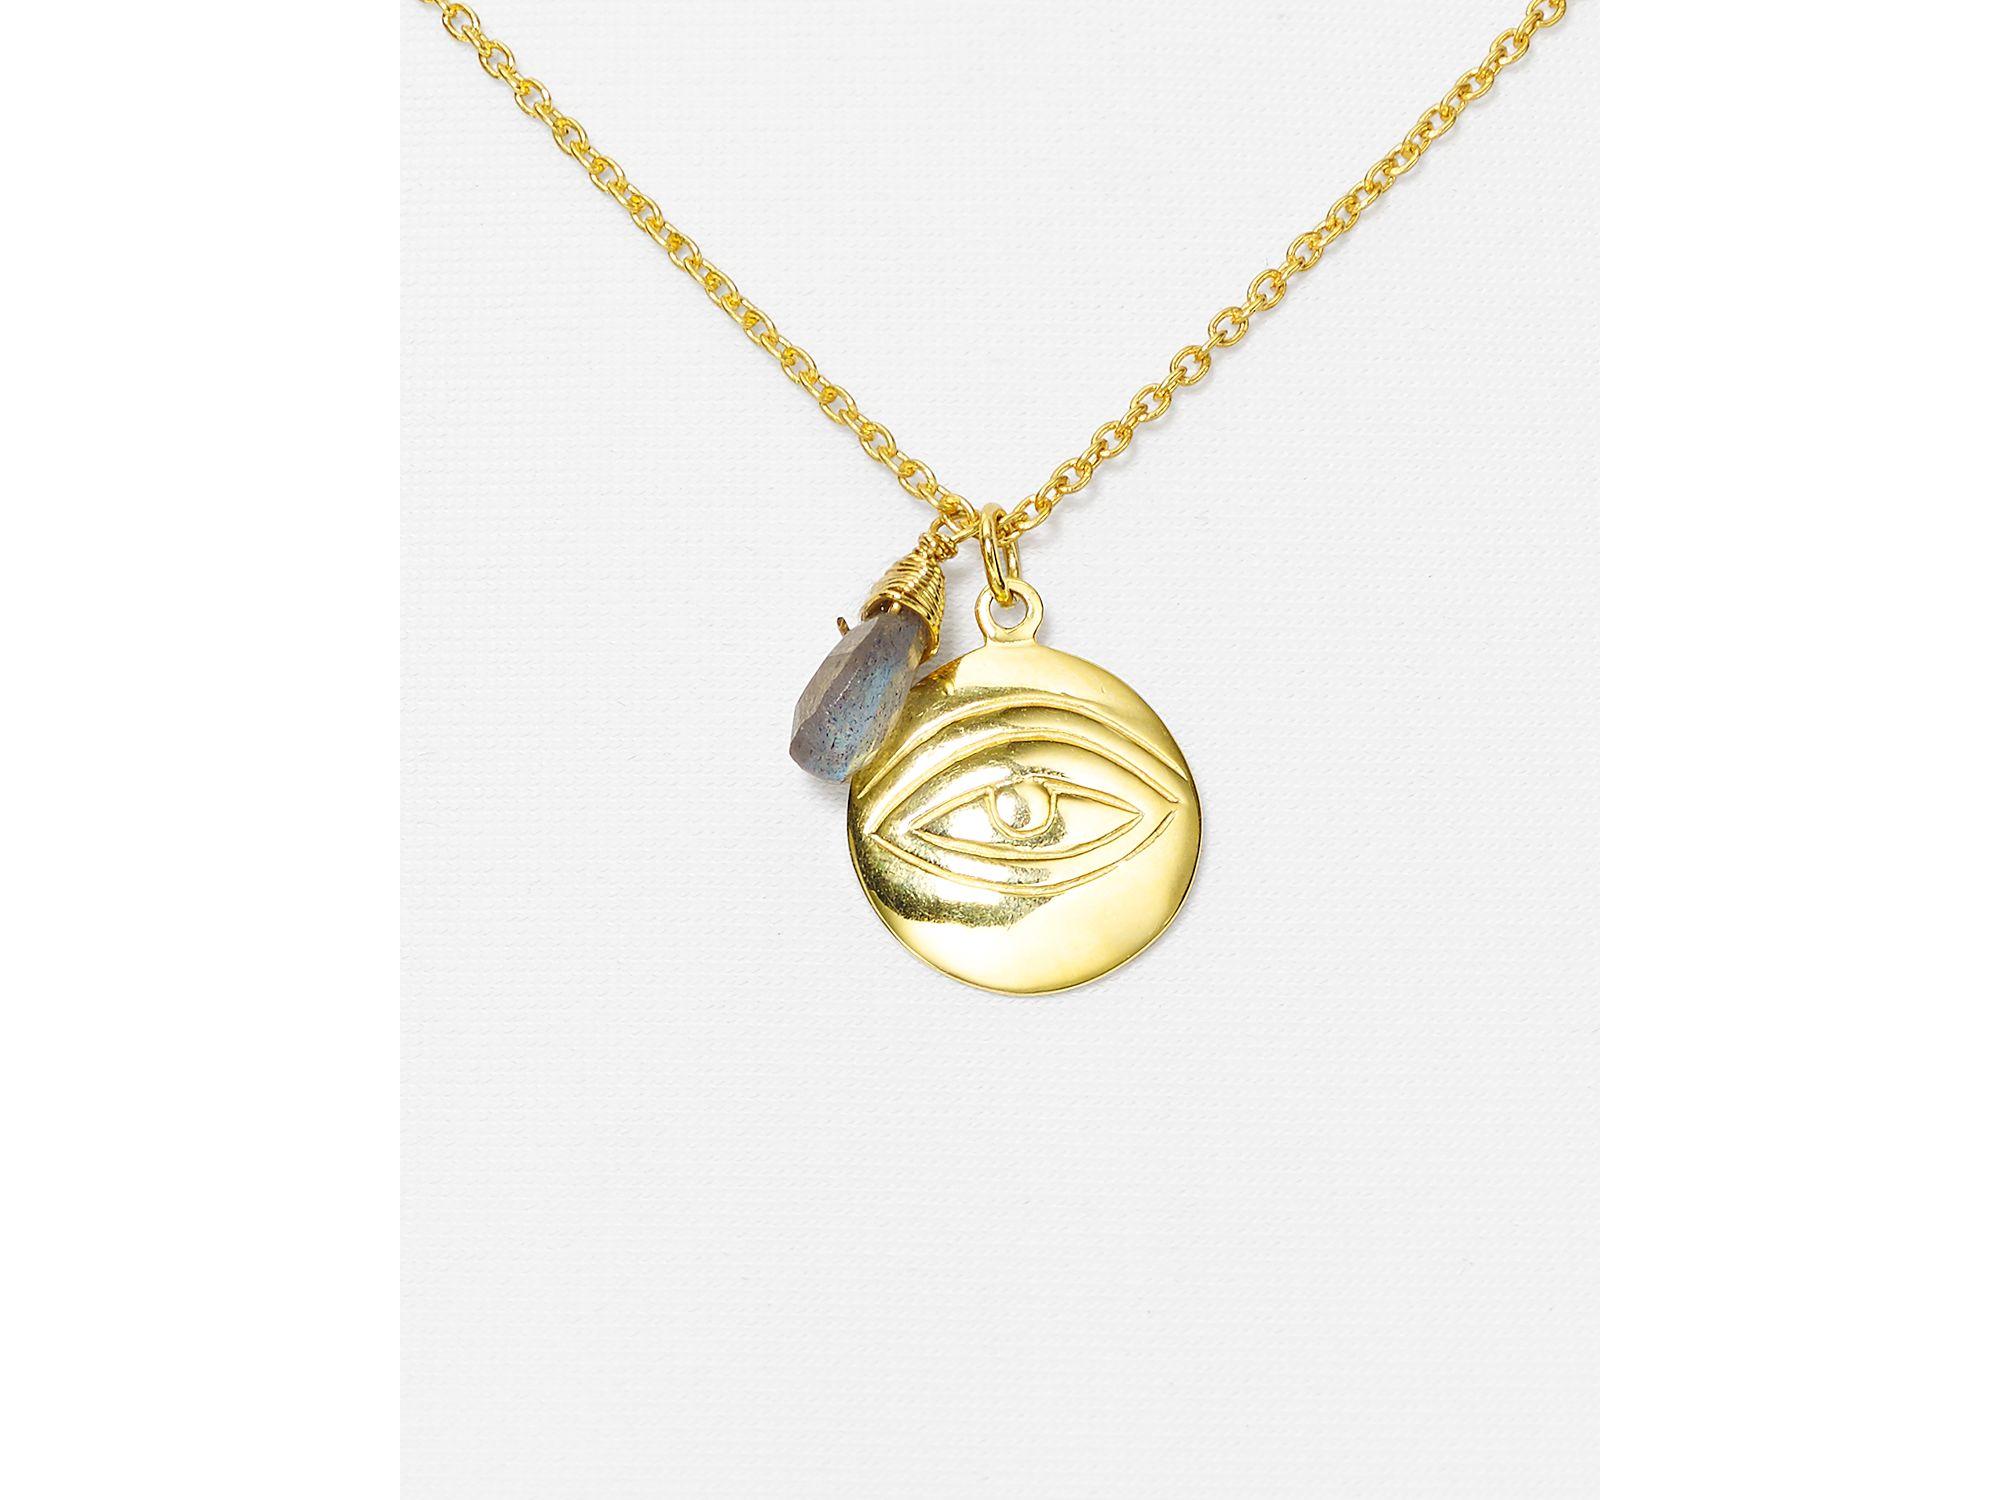 argento vivo labradorite evil eye pendant necklace 16 quot in